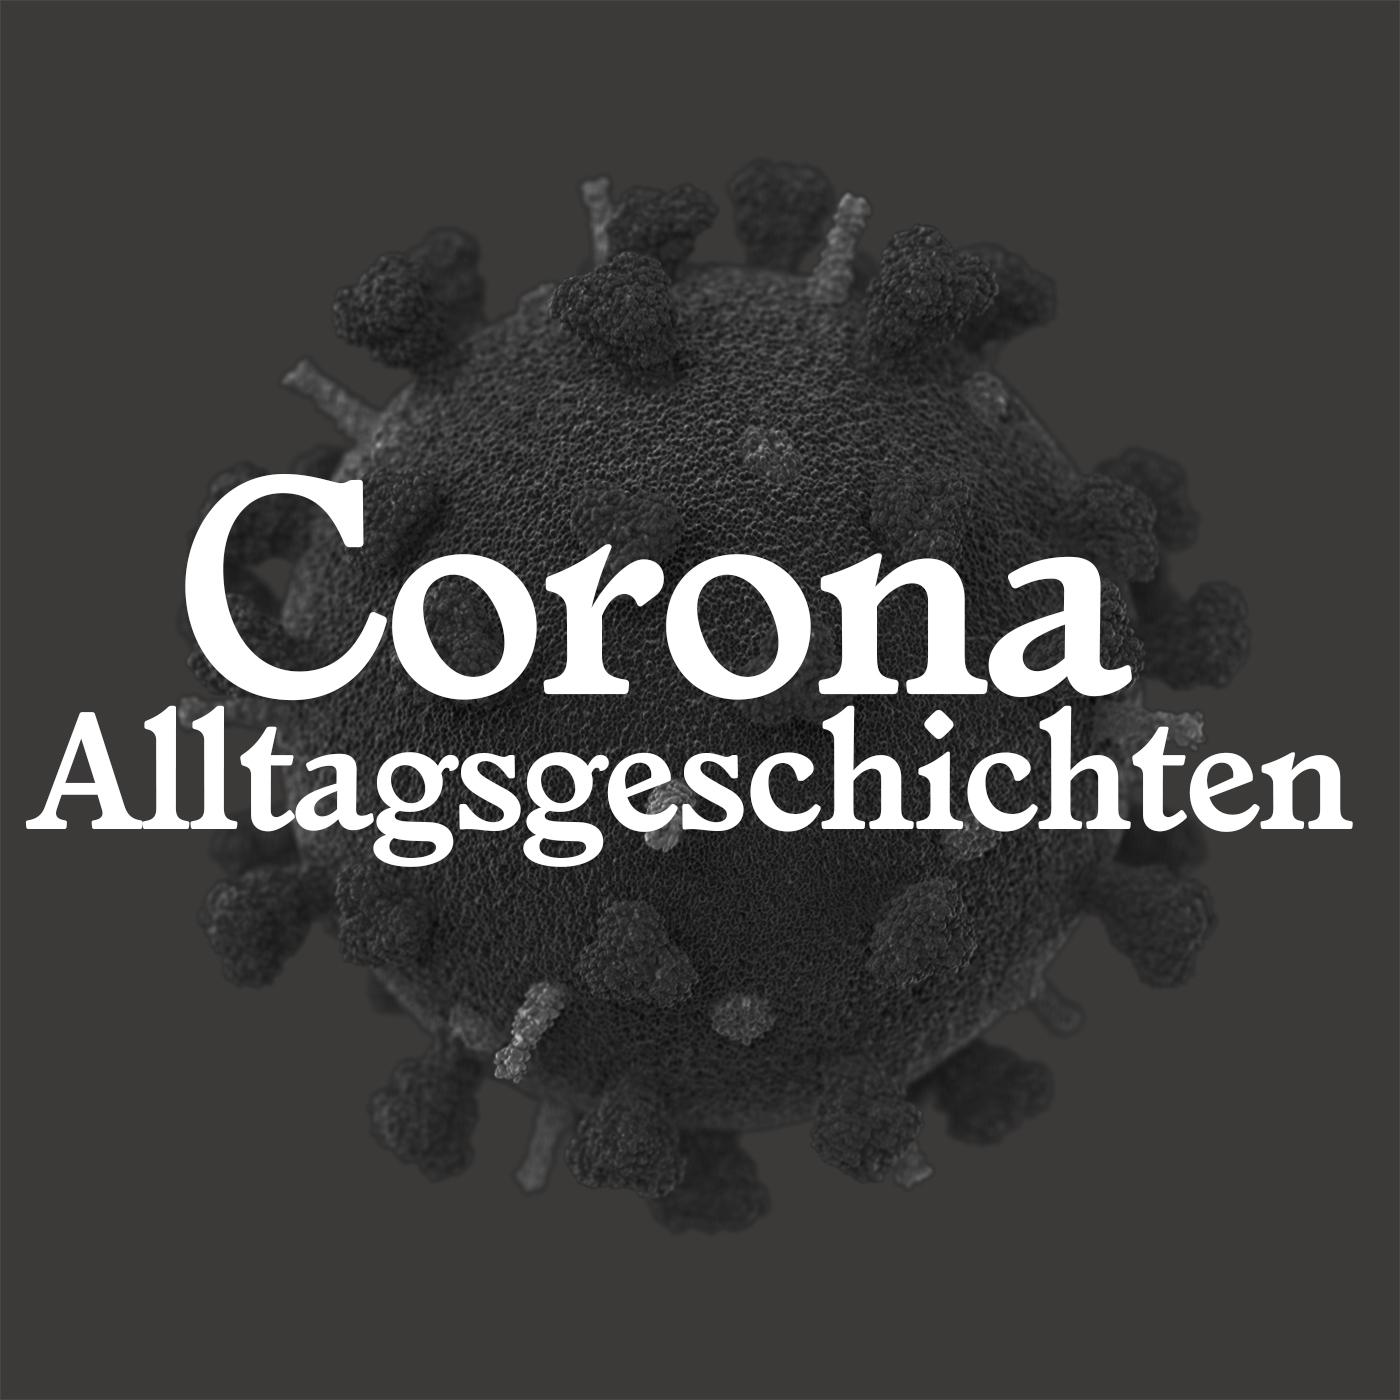 """Seelsorge hat sich ins Internet verlagert"" – Corona-Alltagsgeschichten"